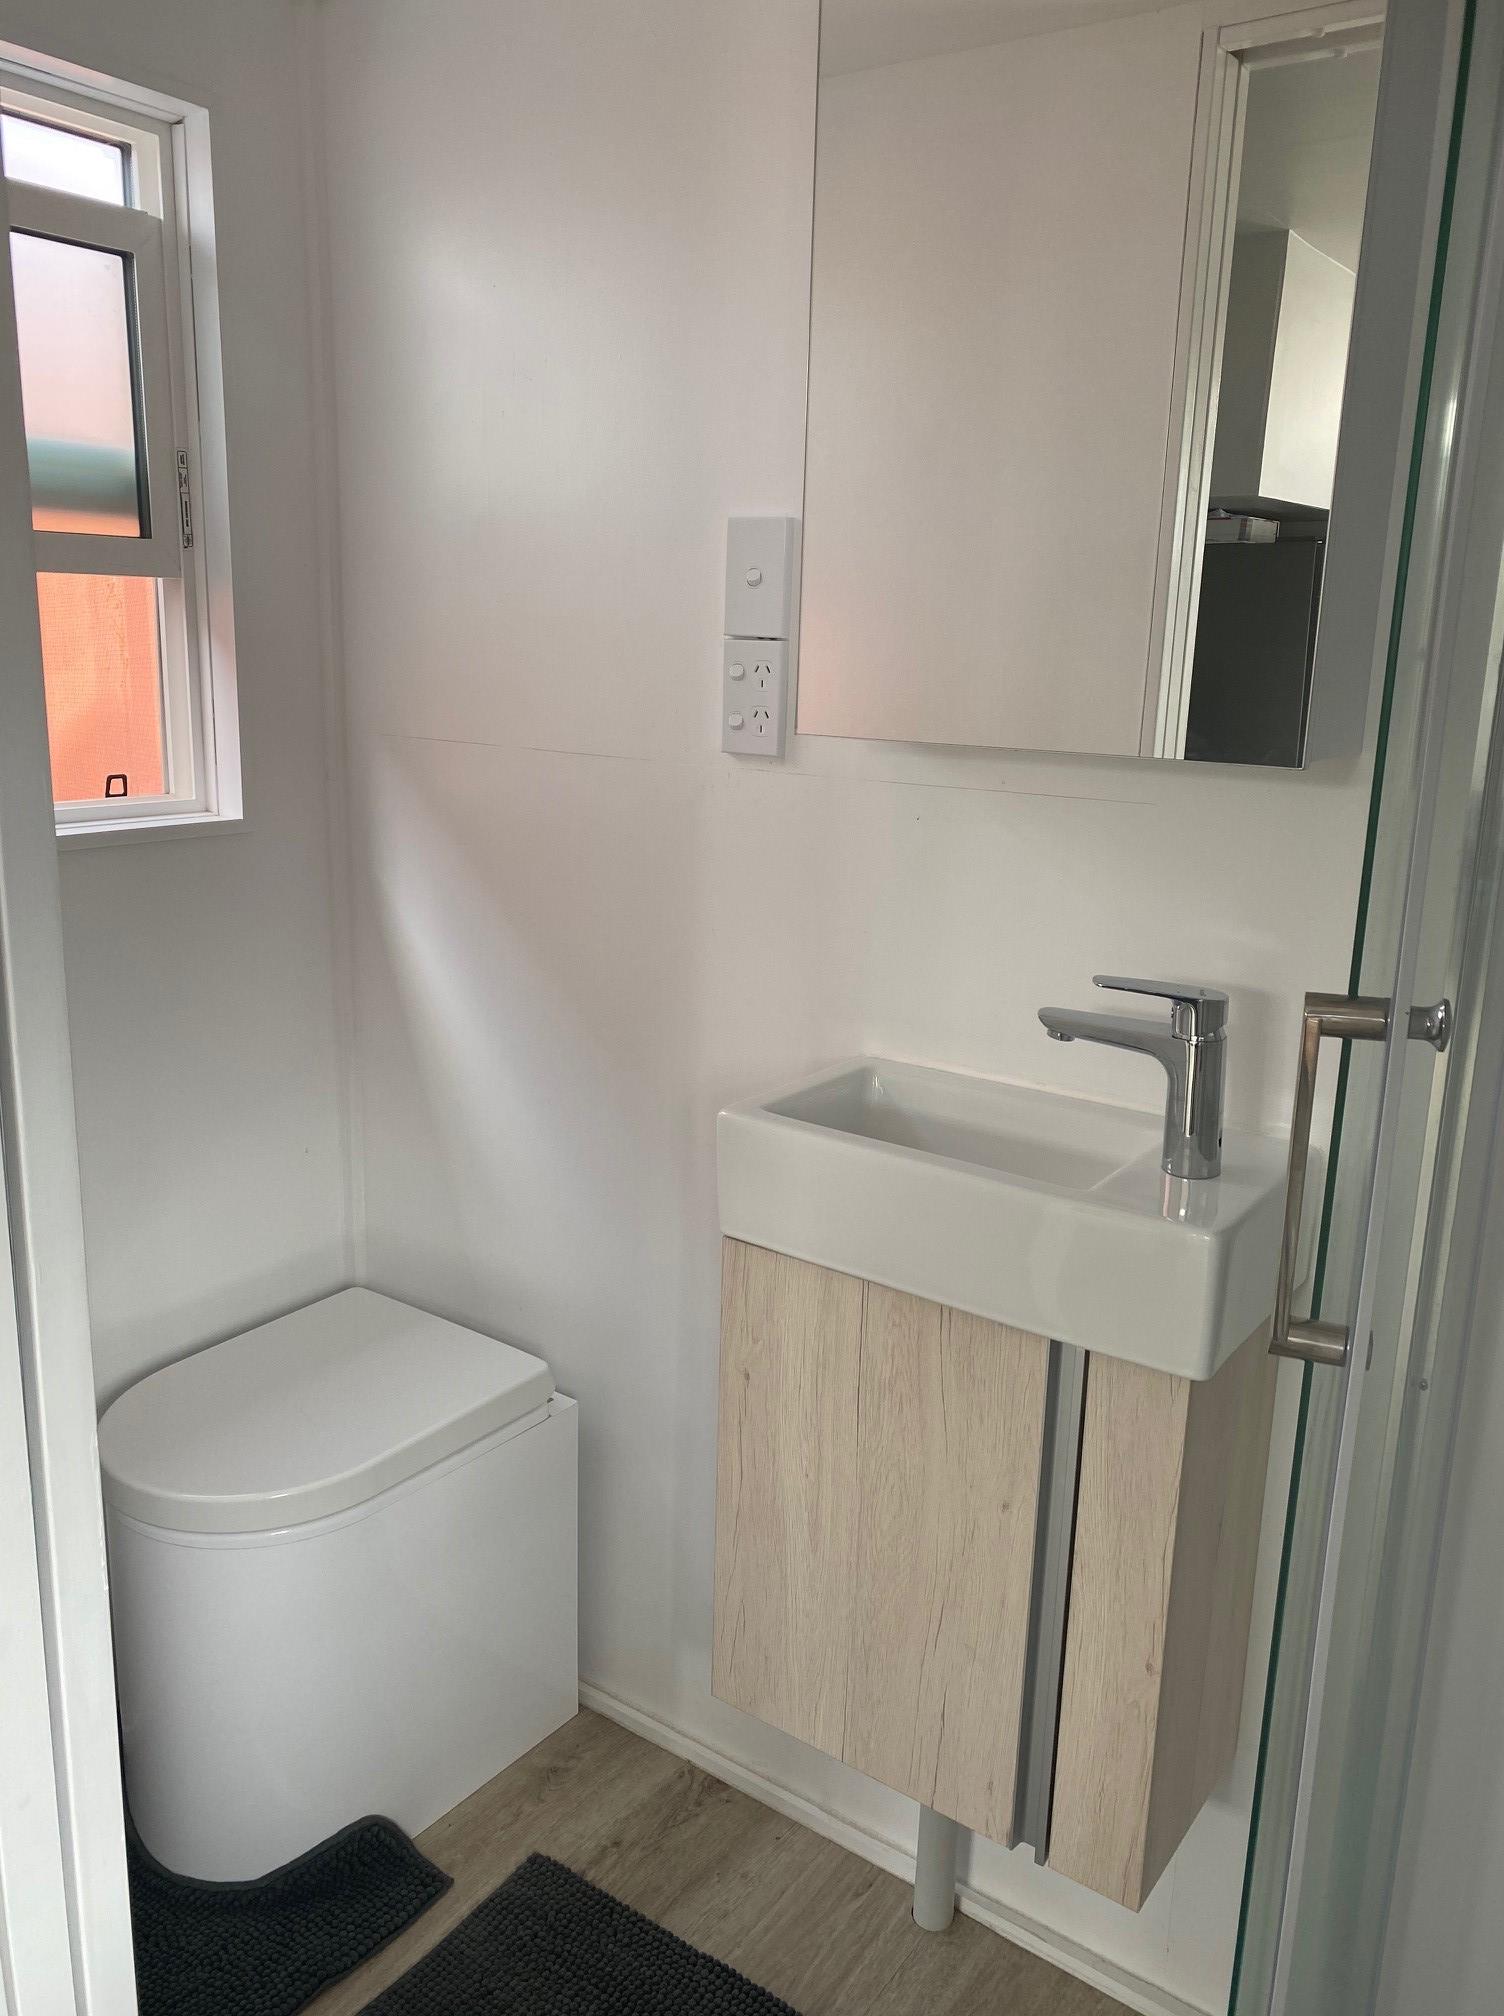 Tiny Home - Toilet